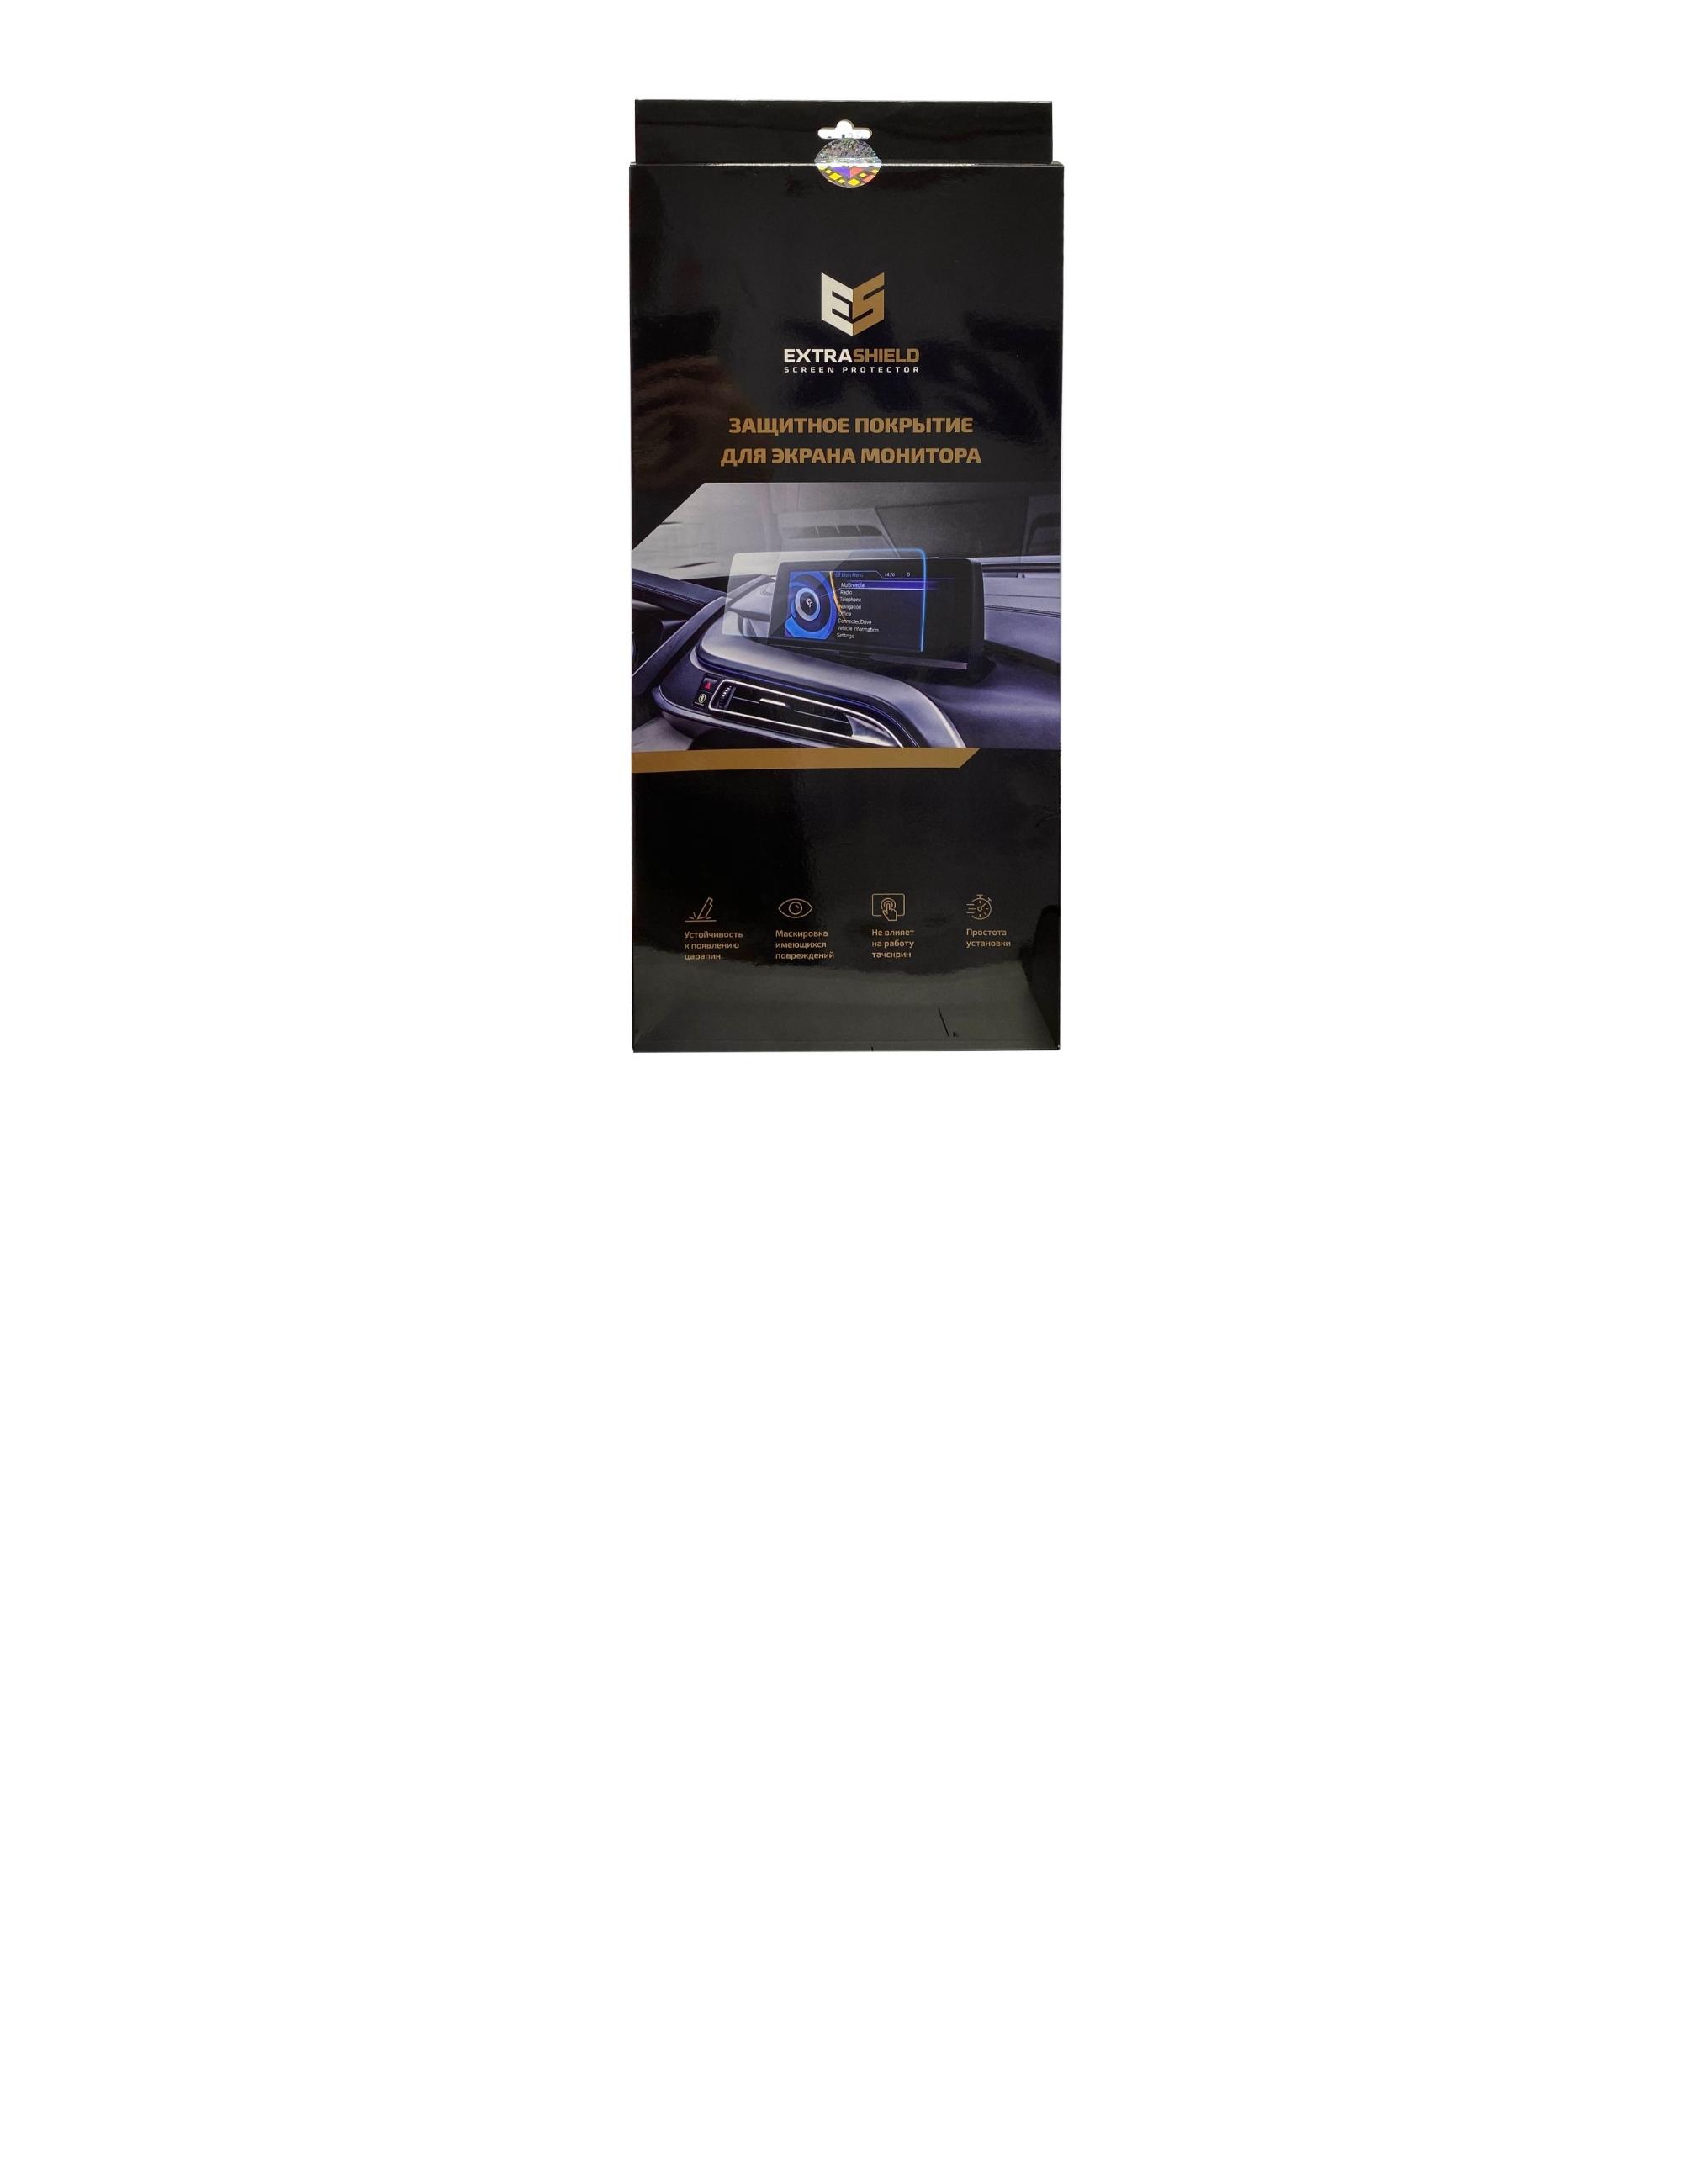 Volkswagen Terramont 2016 - 2020 приборная панель AID 2019 12.3 Защитное стекло Матовая